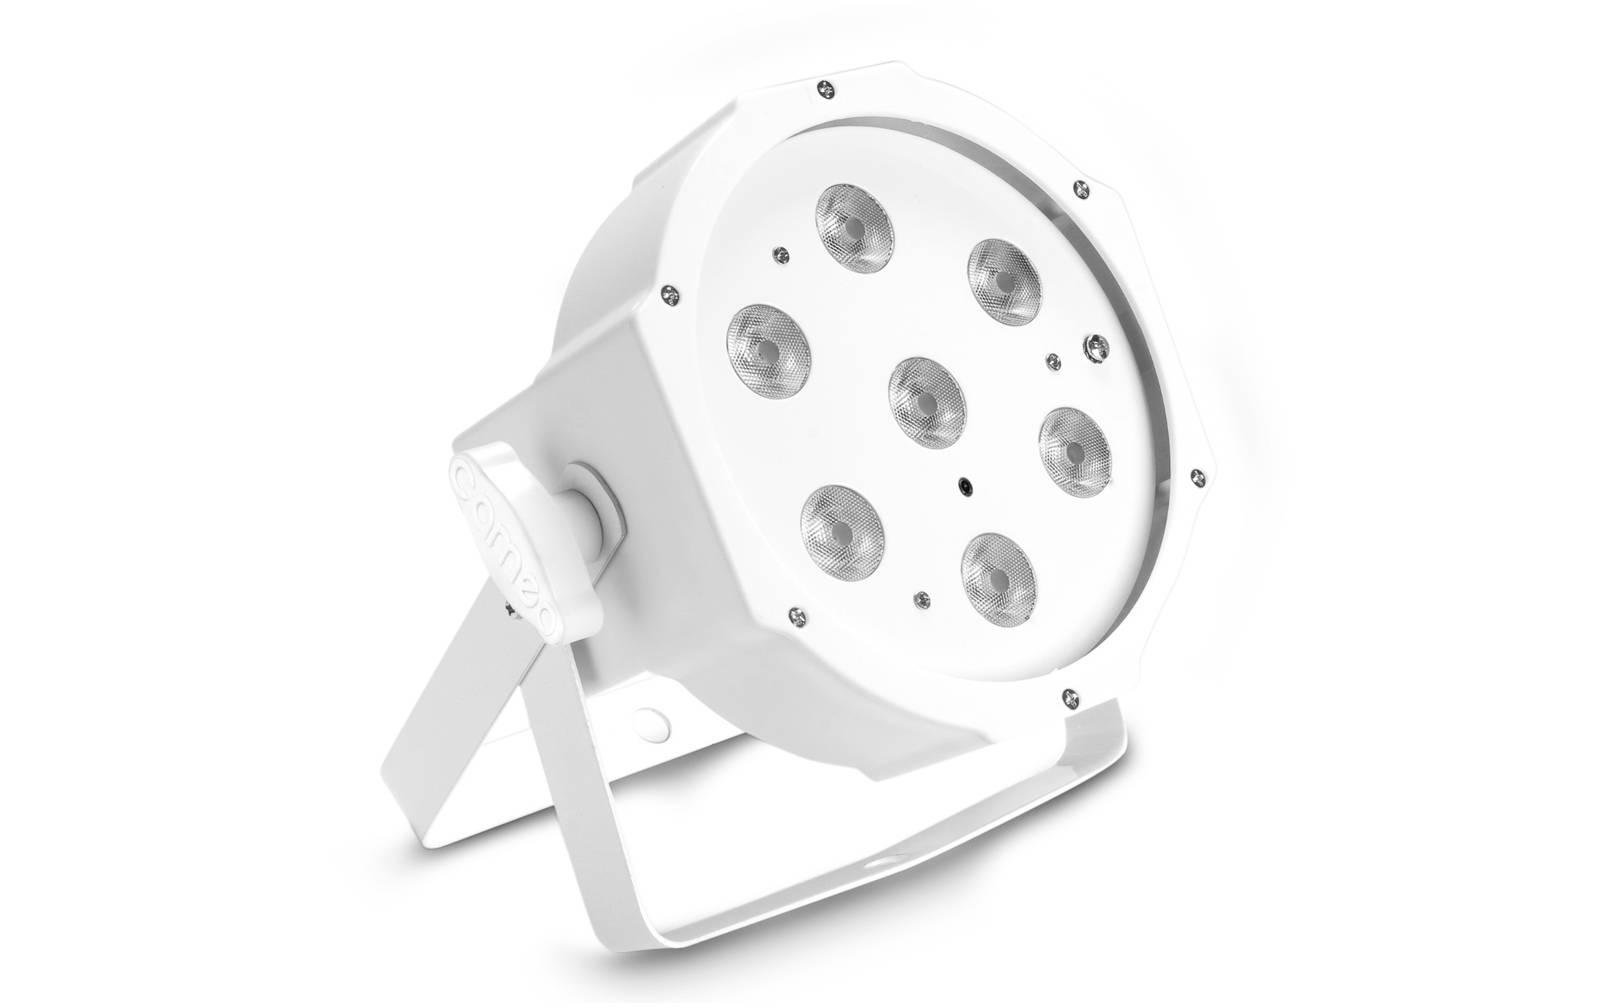 cameo-flat-par-1-tw-ir-wh-7-x-4-w-high-power-flat-tunable-white-led-par-scheinwerfer-mit-ir-fernbedi